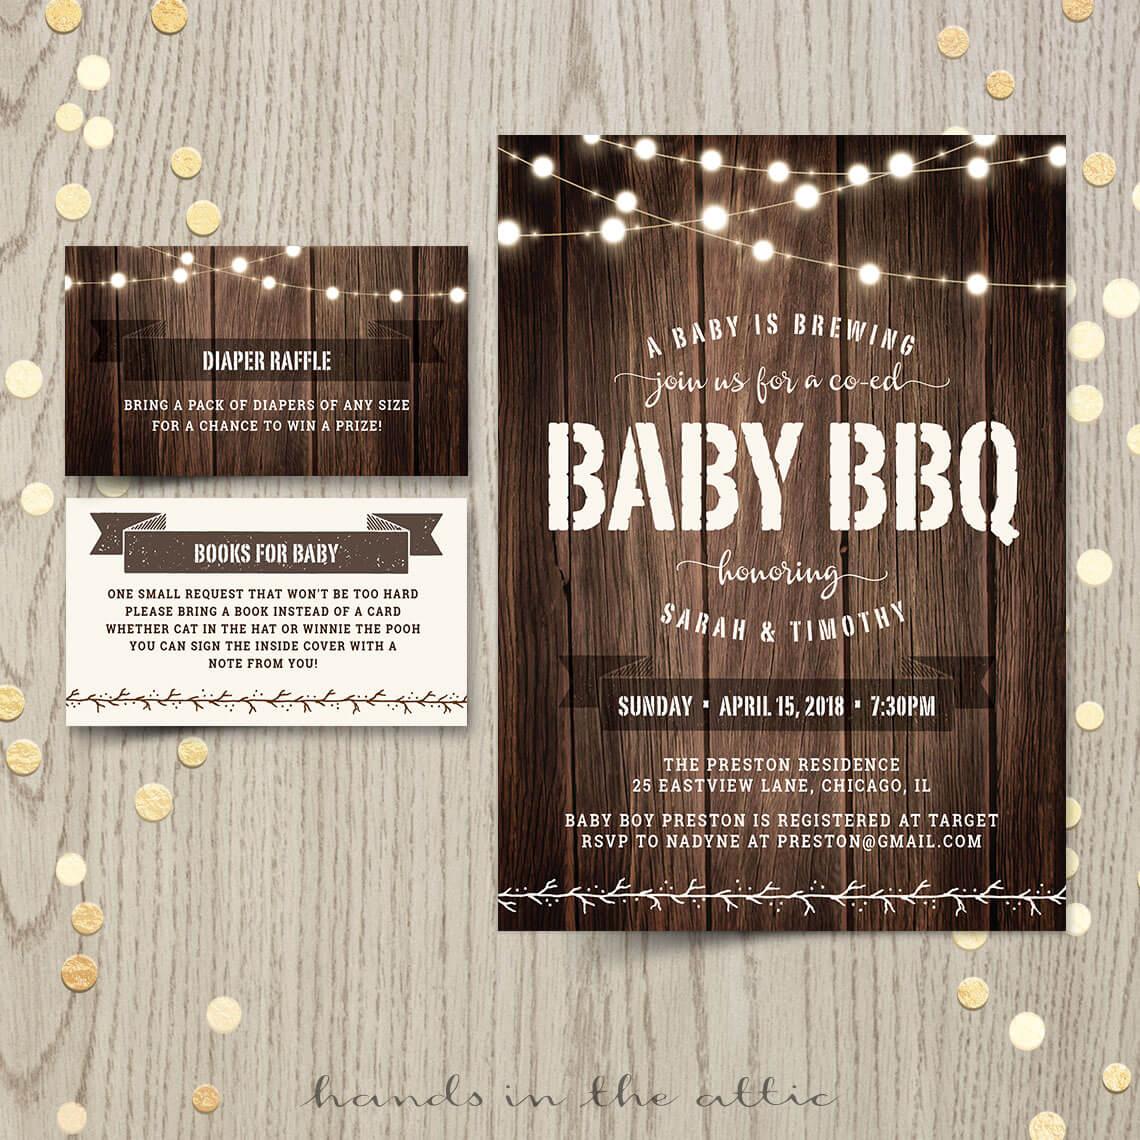 Baby bbq shower invitation printable stationery - Baby shower invitations and decorations ...